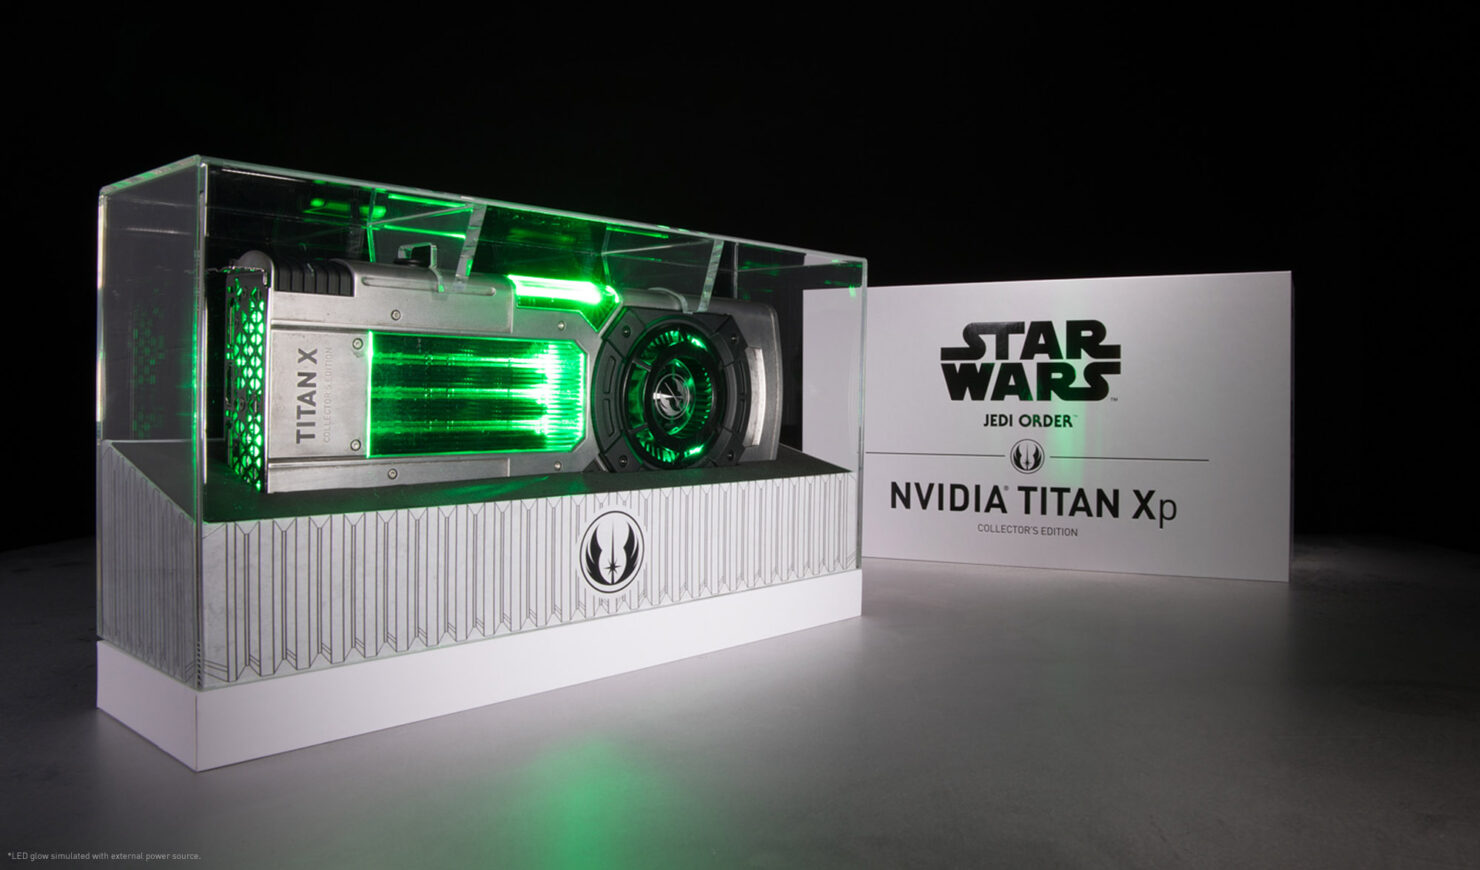 nvidia-titan-xp-ce-star-wars-jedi-order-gallery-06